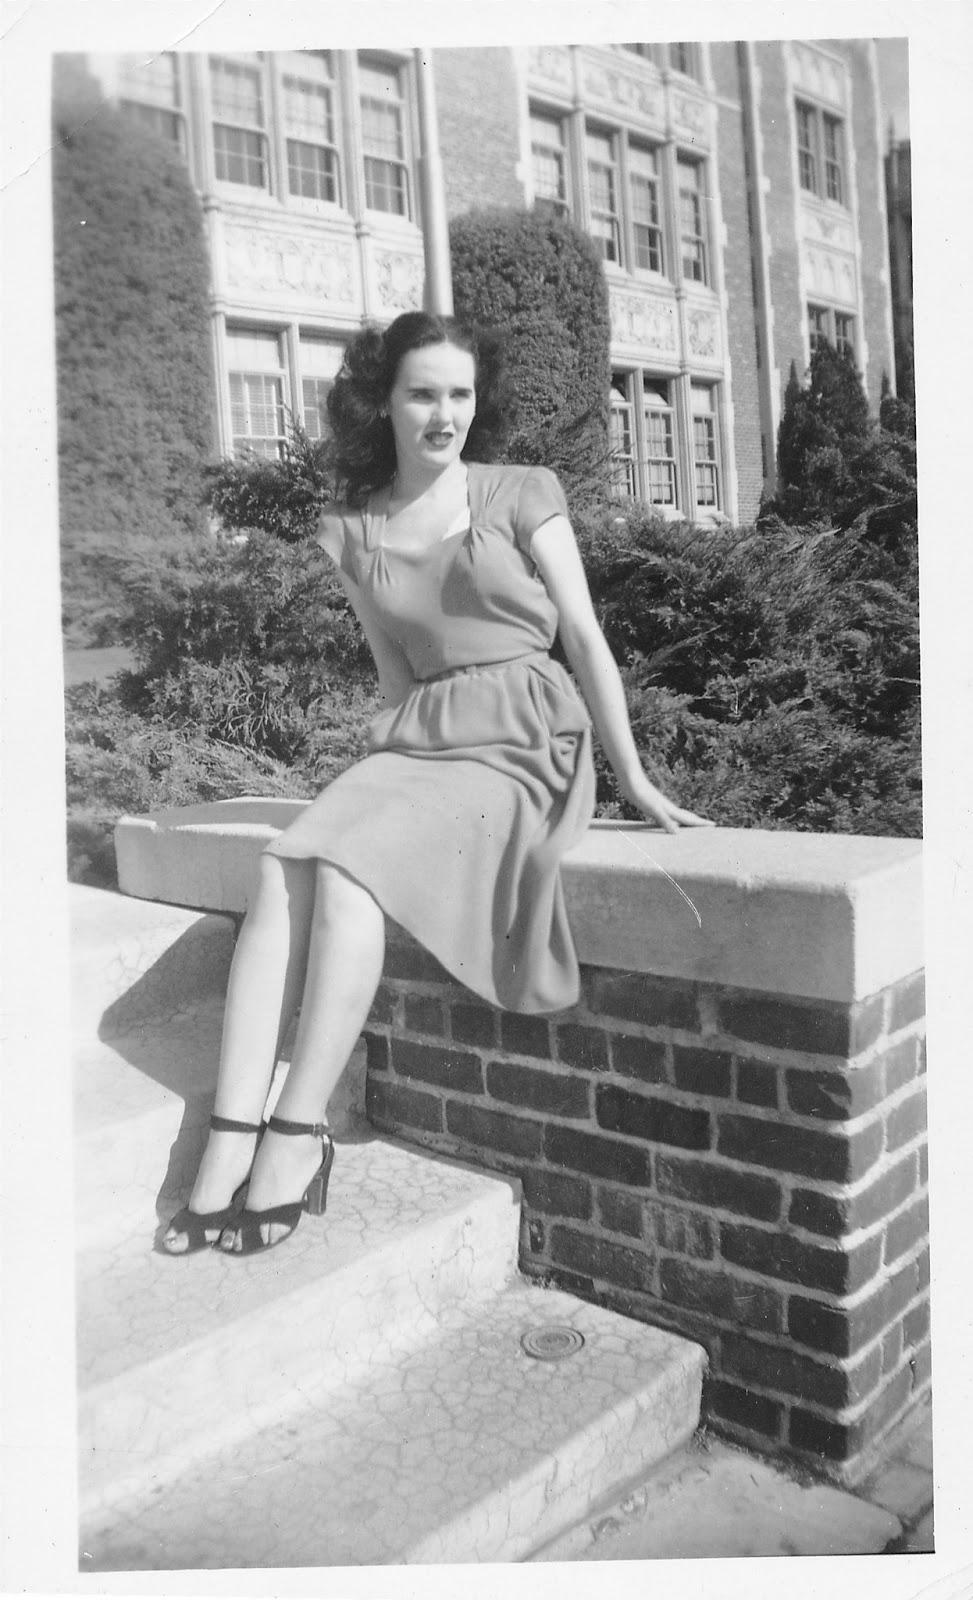 elizabeth-short-1946-1551719036124-1551719038319.jpg